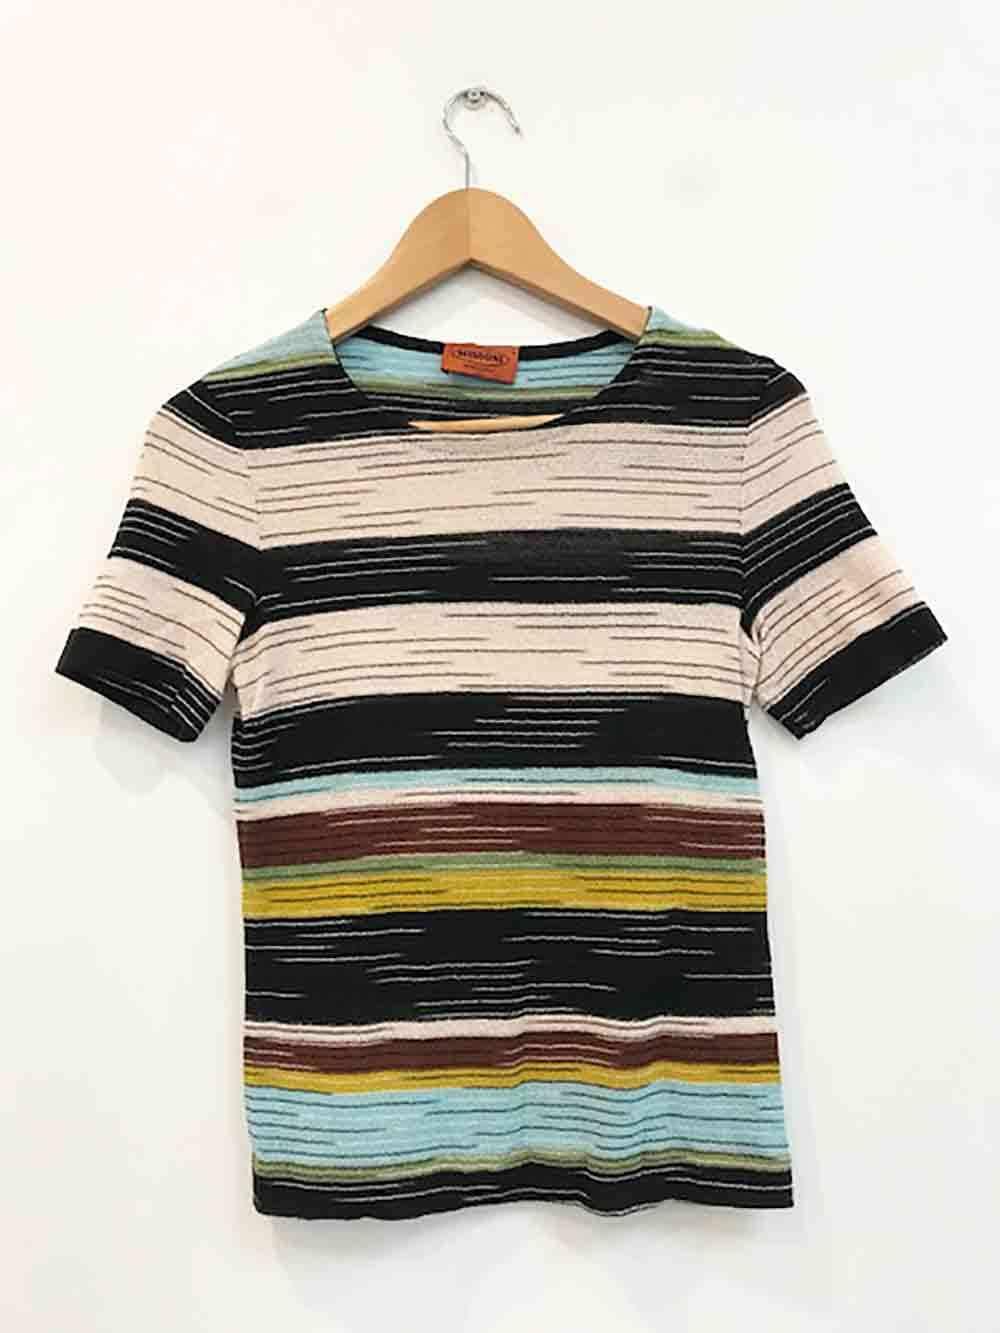 Designer Missoni VTG Größe Small Classic Missoni Knit Cotton Blend Woherren Top